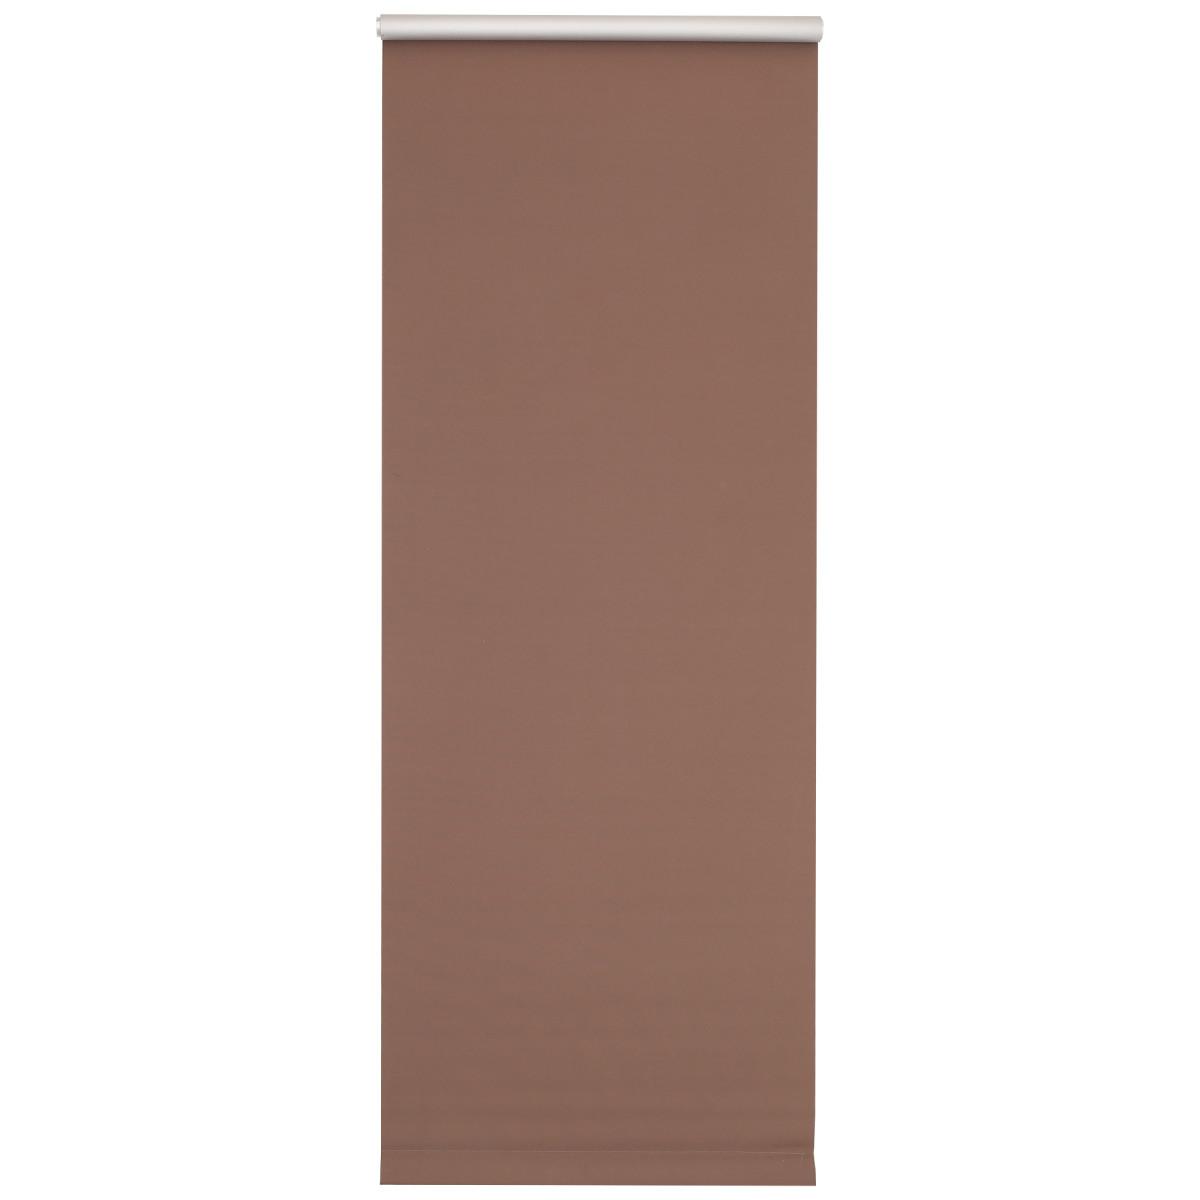 Мини-Штора Рулонная Blackout 50Х150 Цвет Шоколадный